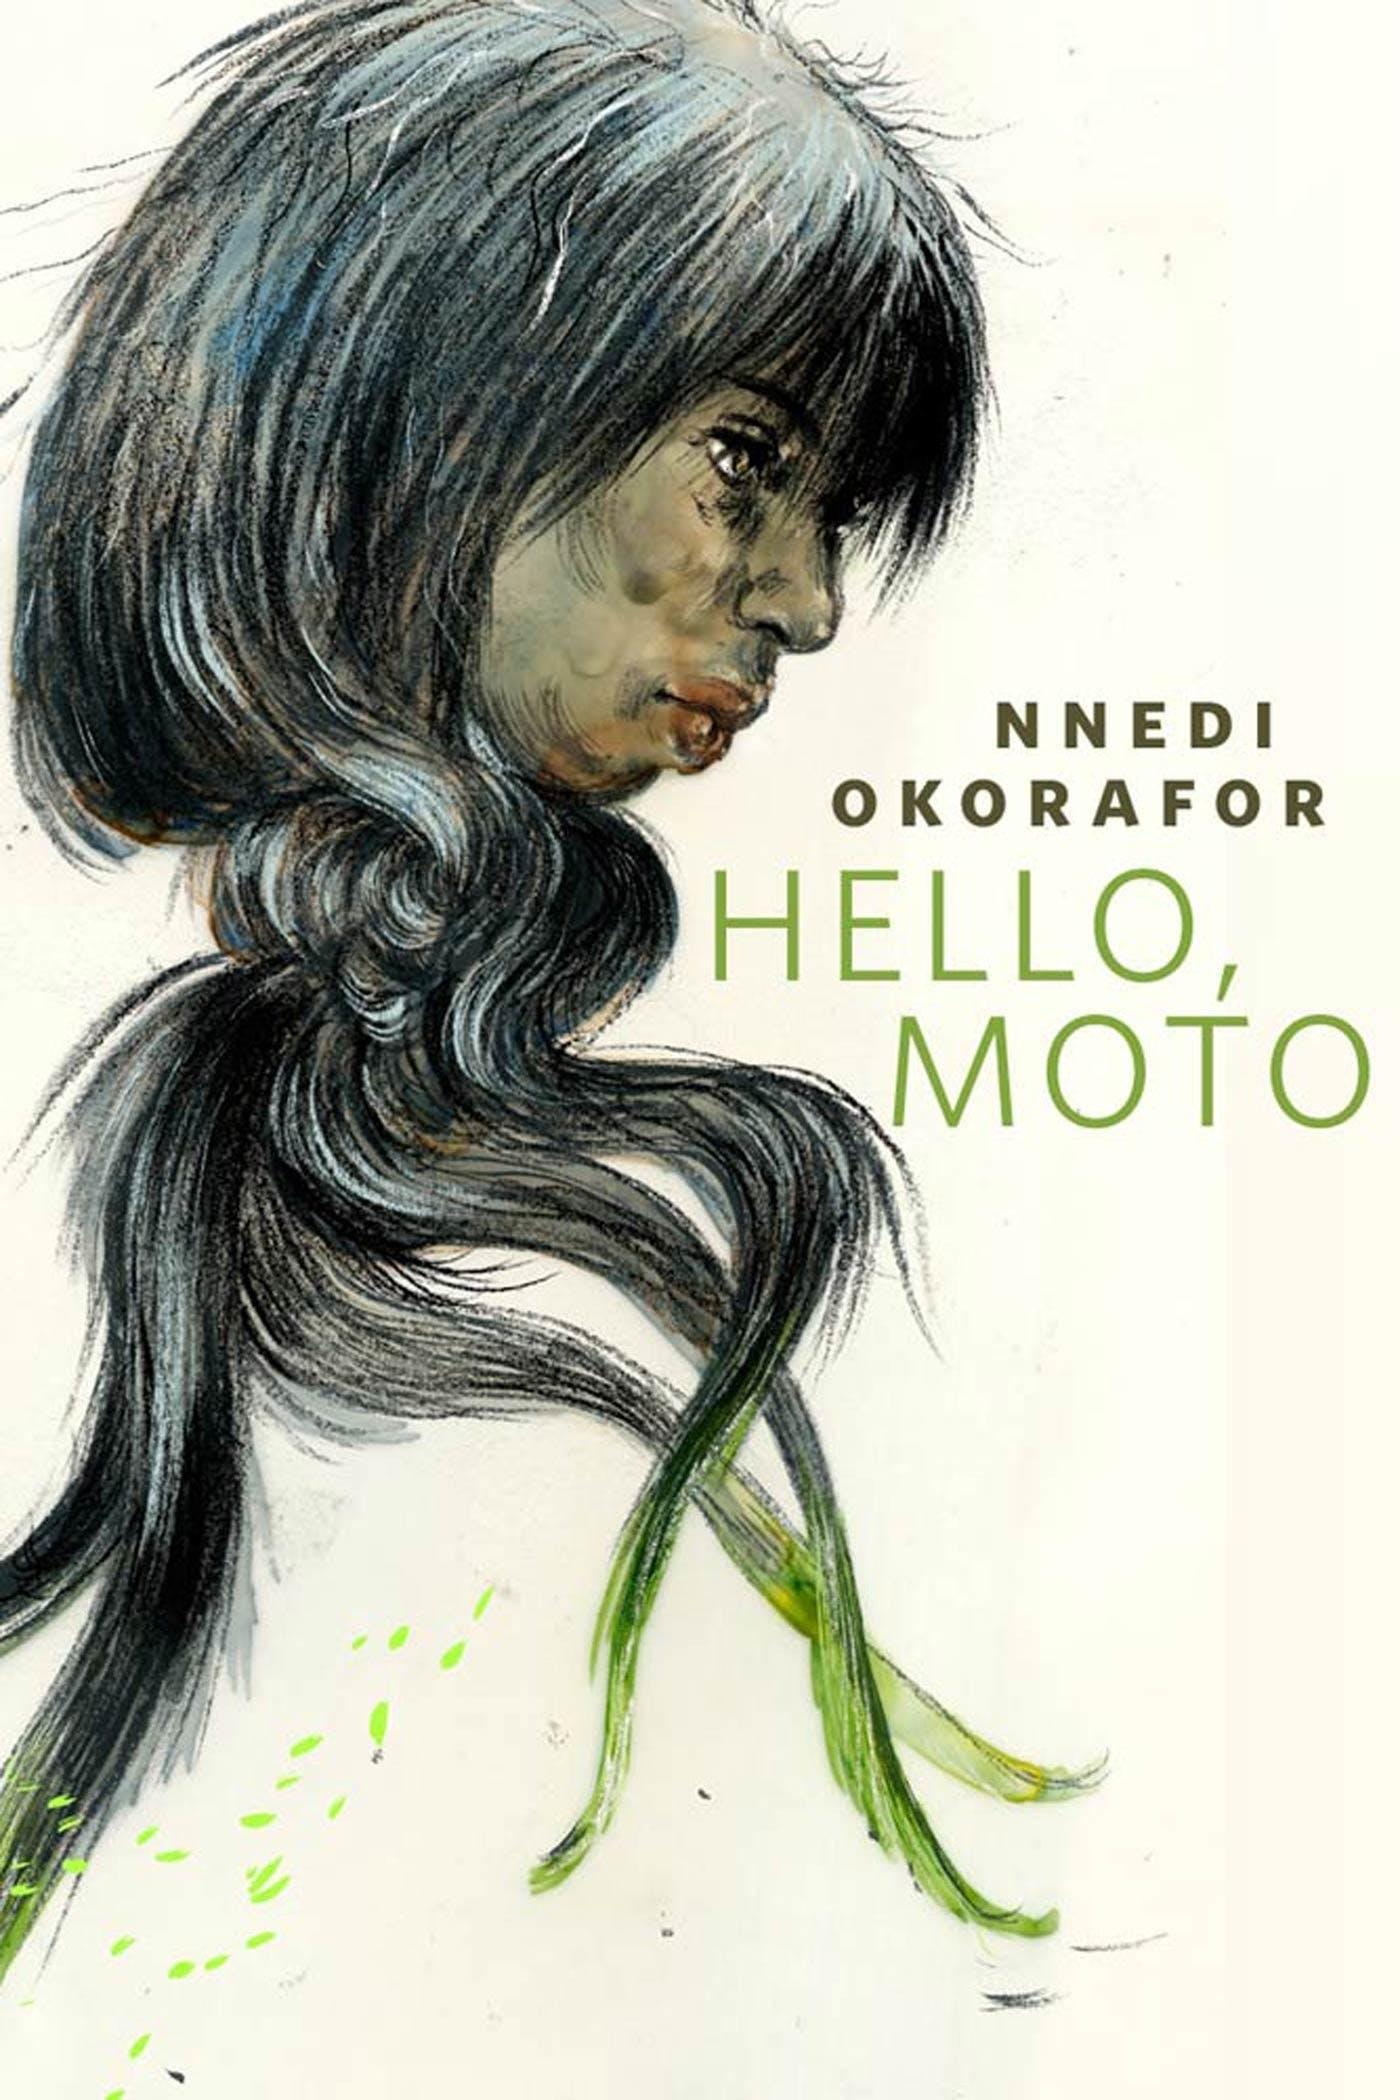 Image of Hello, Moto